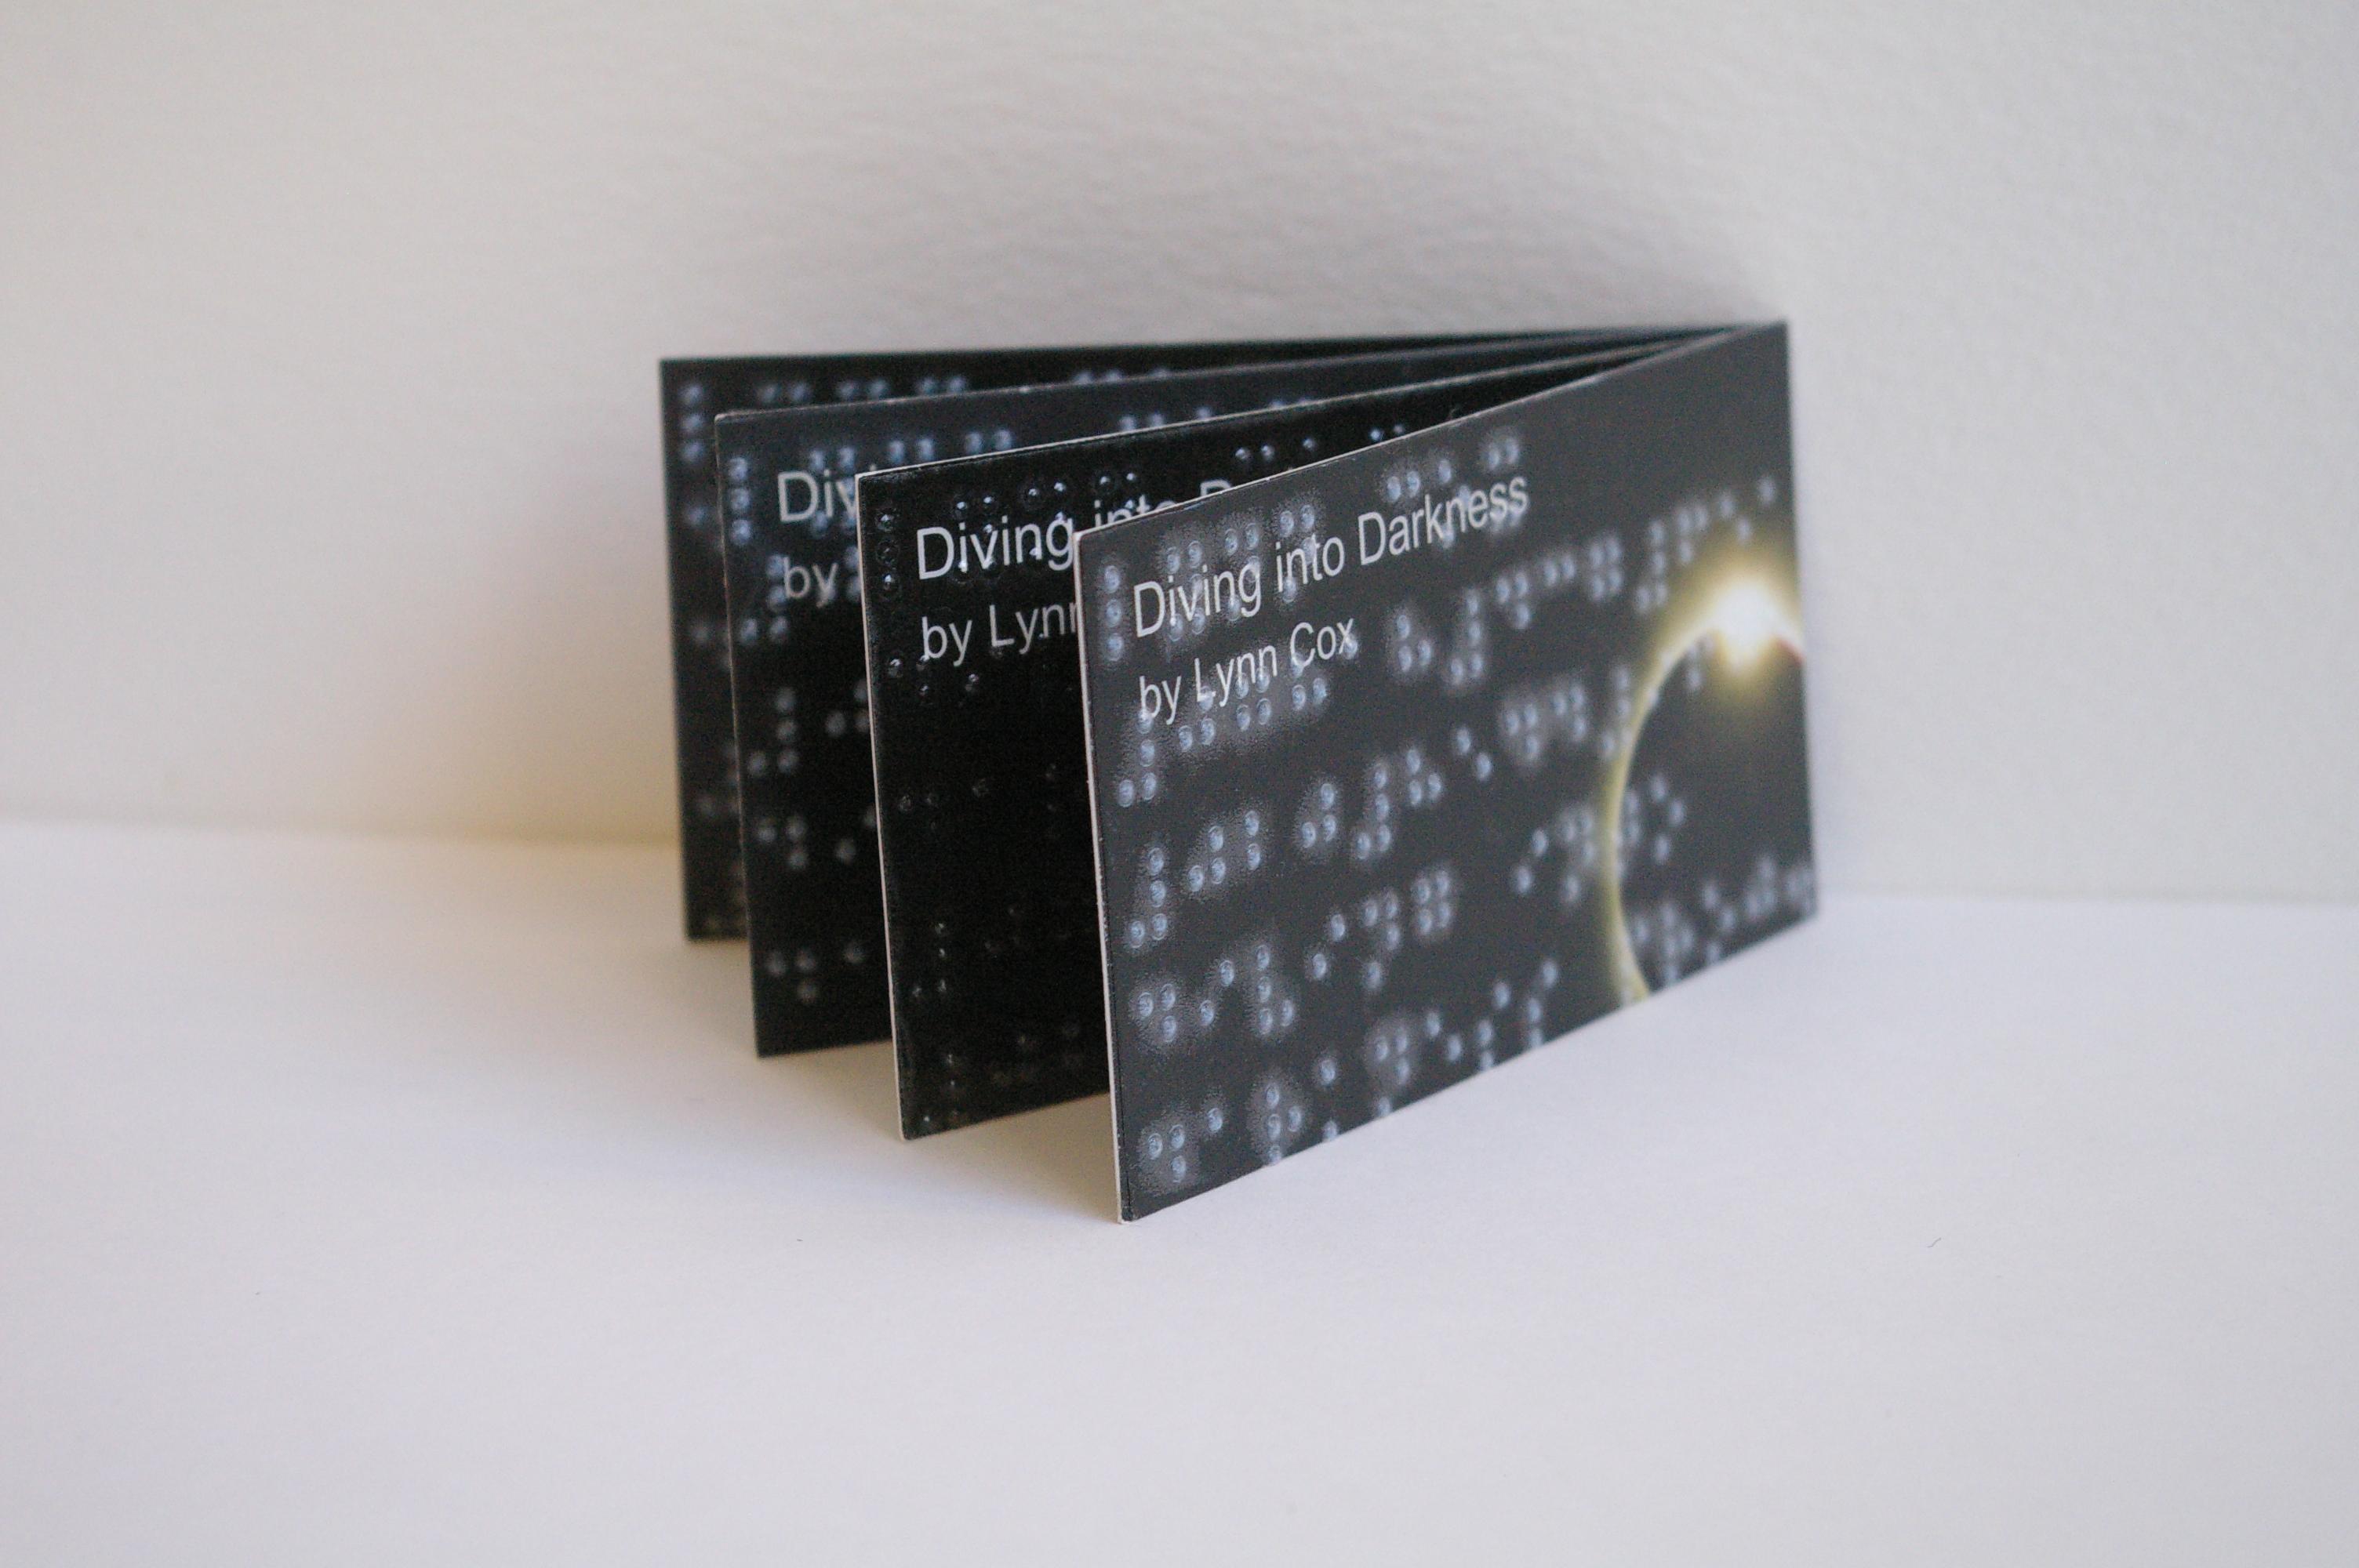 Braille Business Card Service: Design, Print & Attach – Arts ...